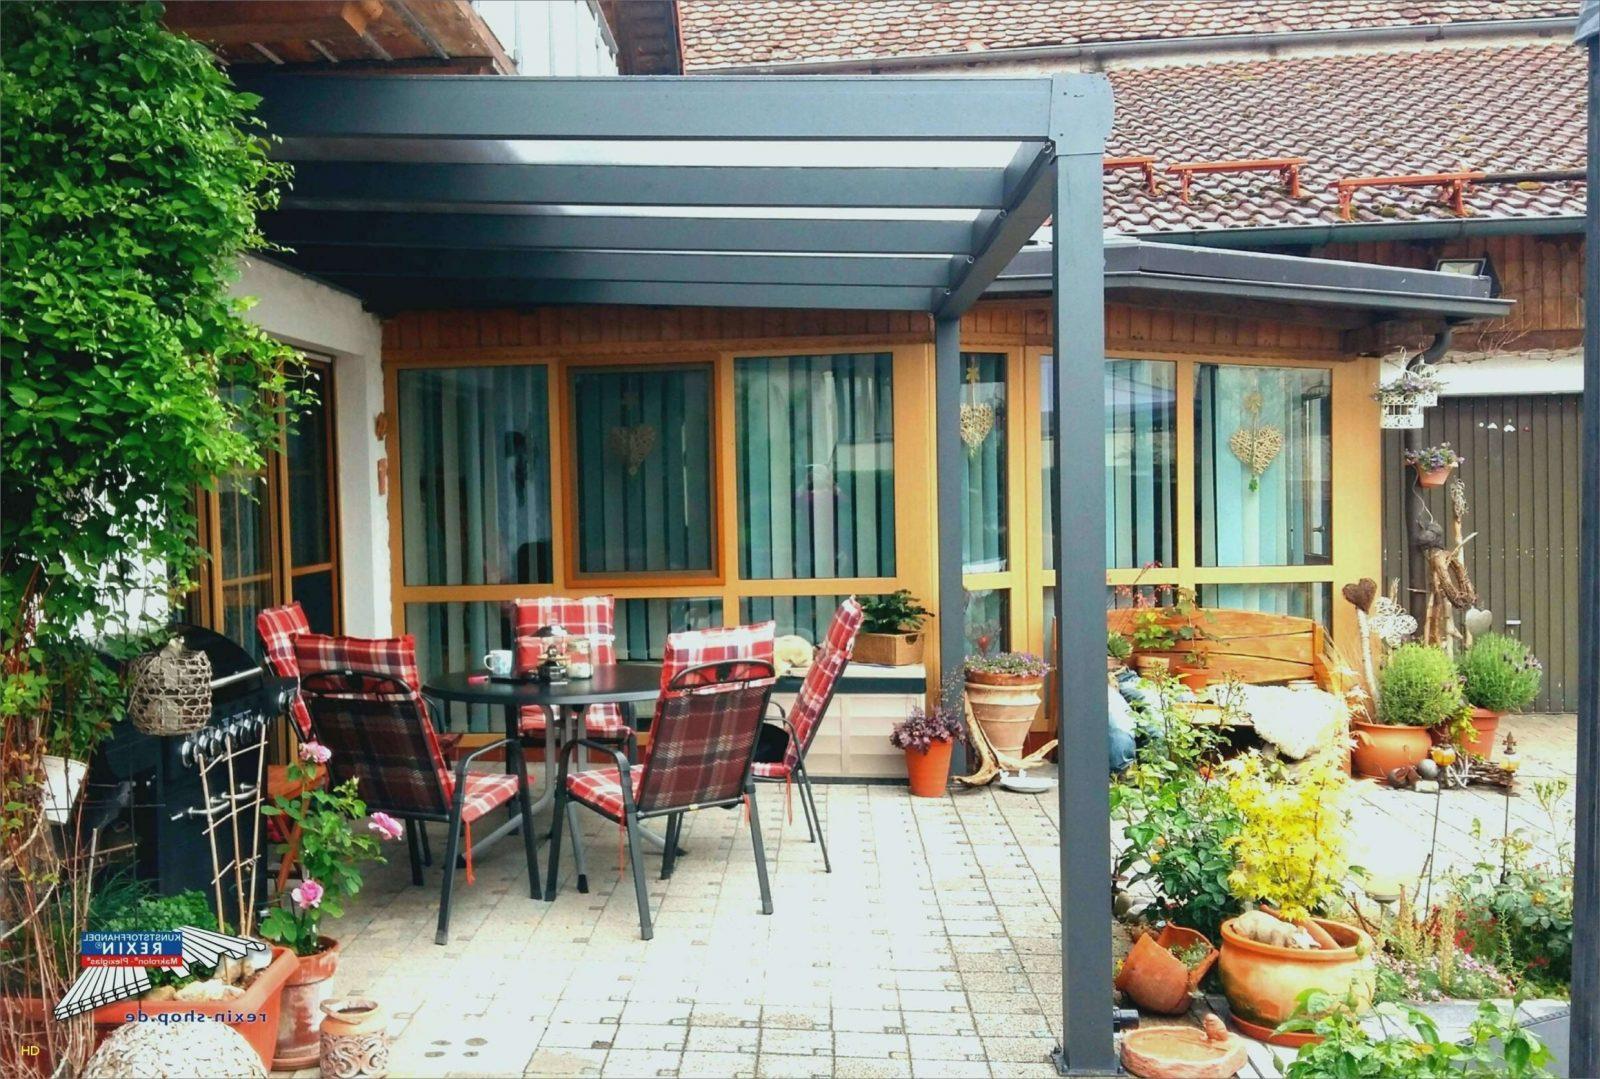 59 Das Beste Aus Für Pergola Selber Bauen Terrasse Design von Pergola Selber Bauen Terrasse Bild